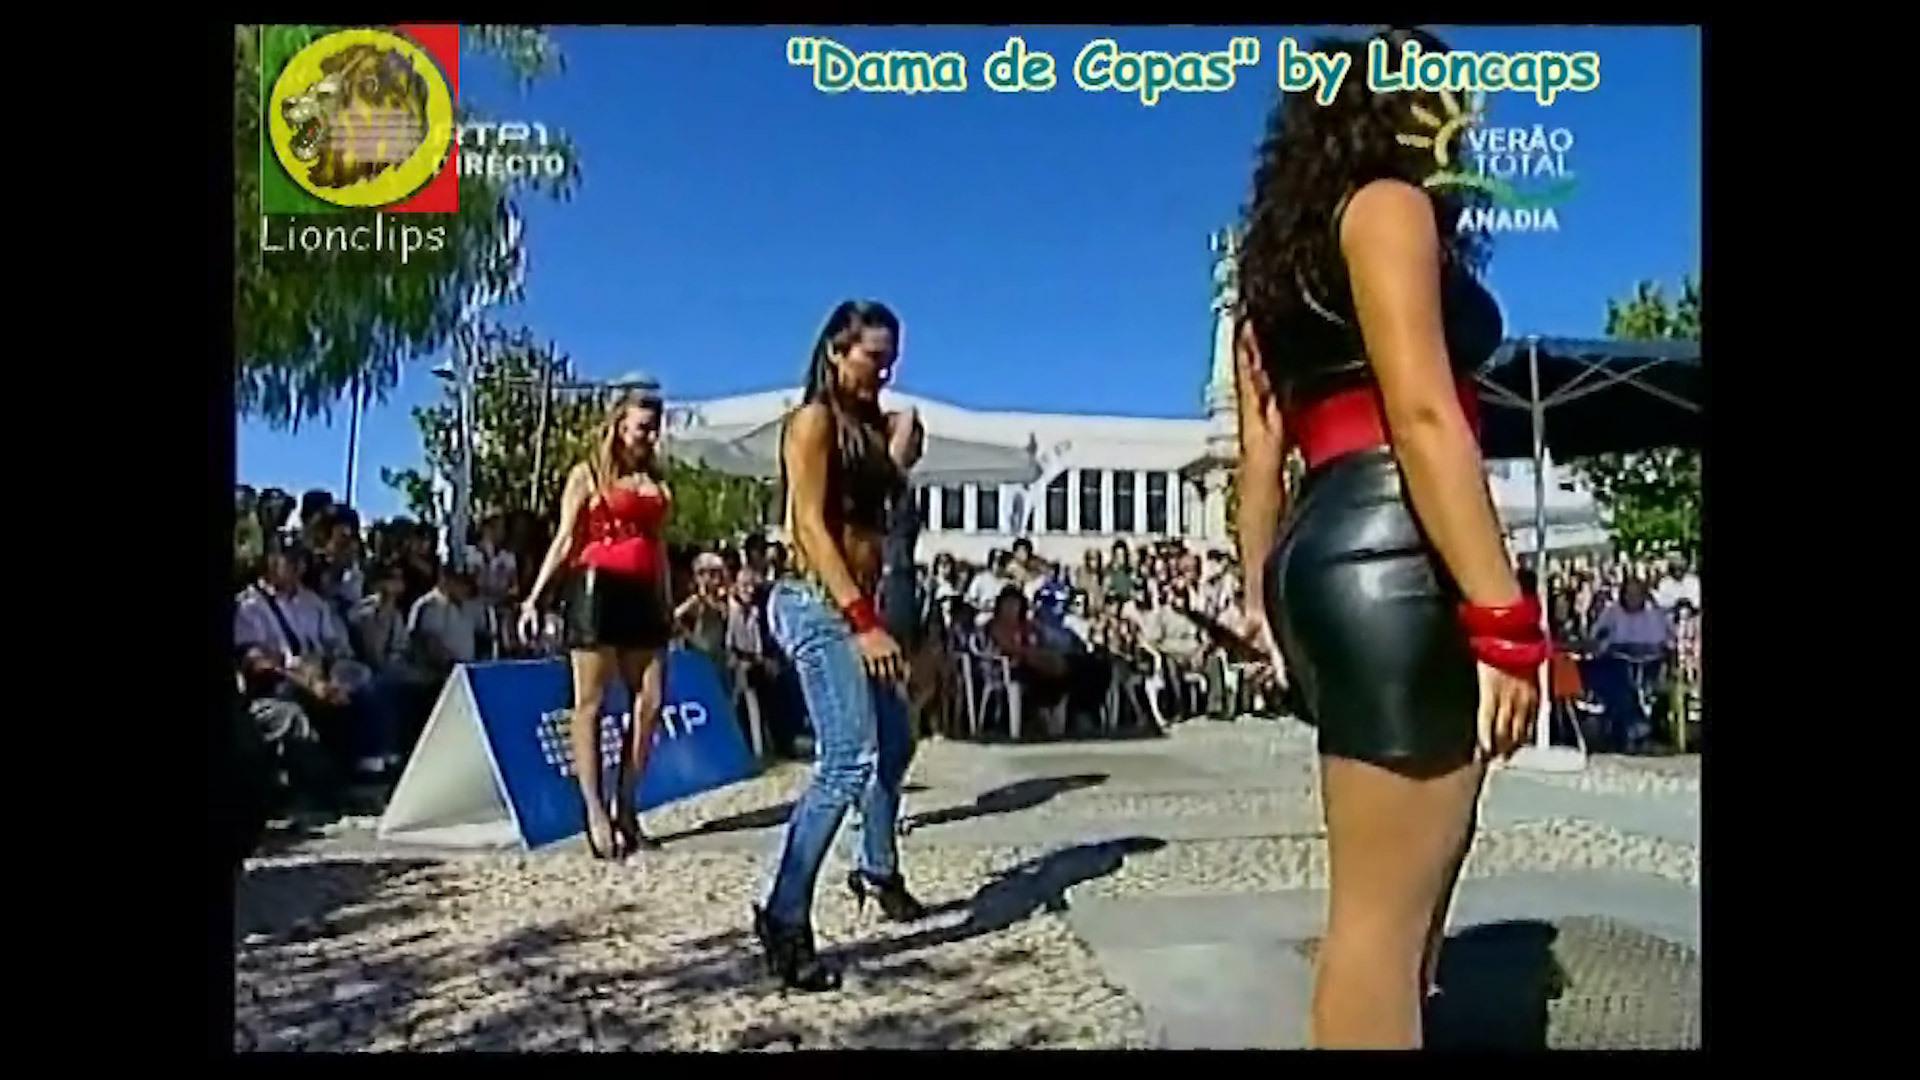 bestoff_portugal_d1_lioncaps_03_06_2021 (9).jpg